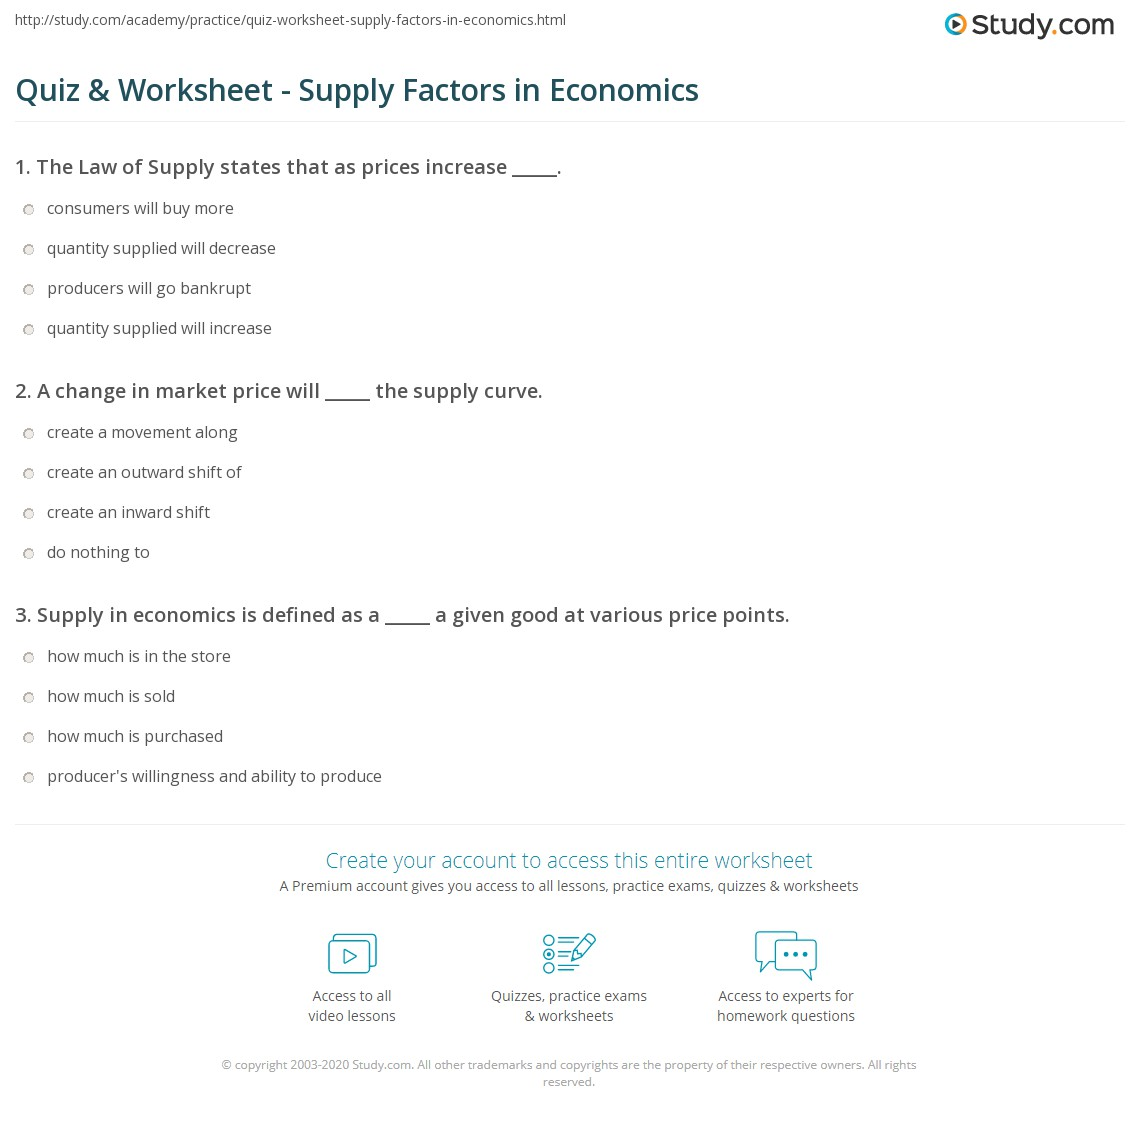 quiz worksheet supply factors in economics. Black Bedroom Furniture Sets. Home Design Ideas